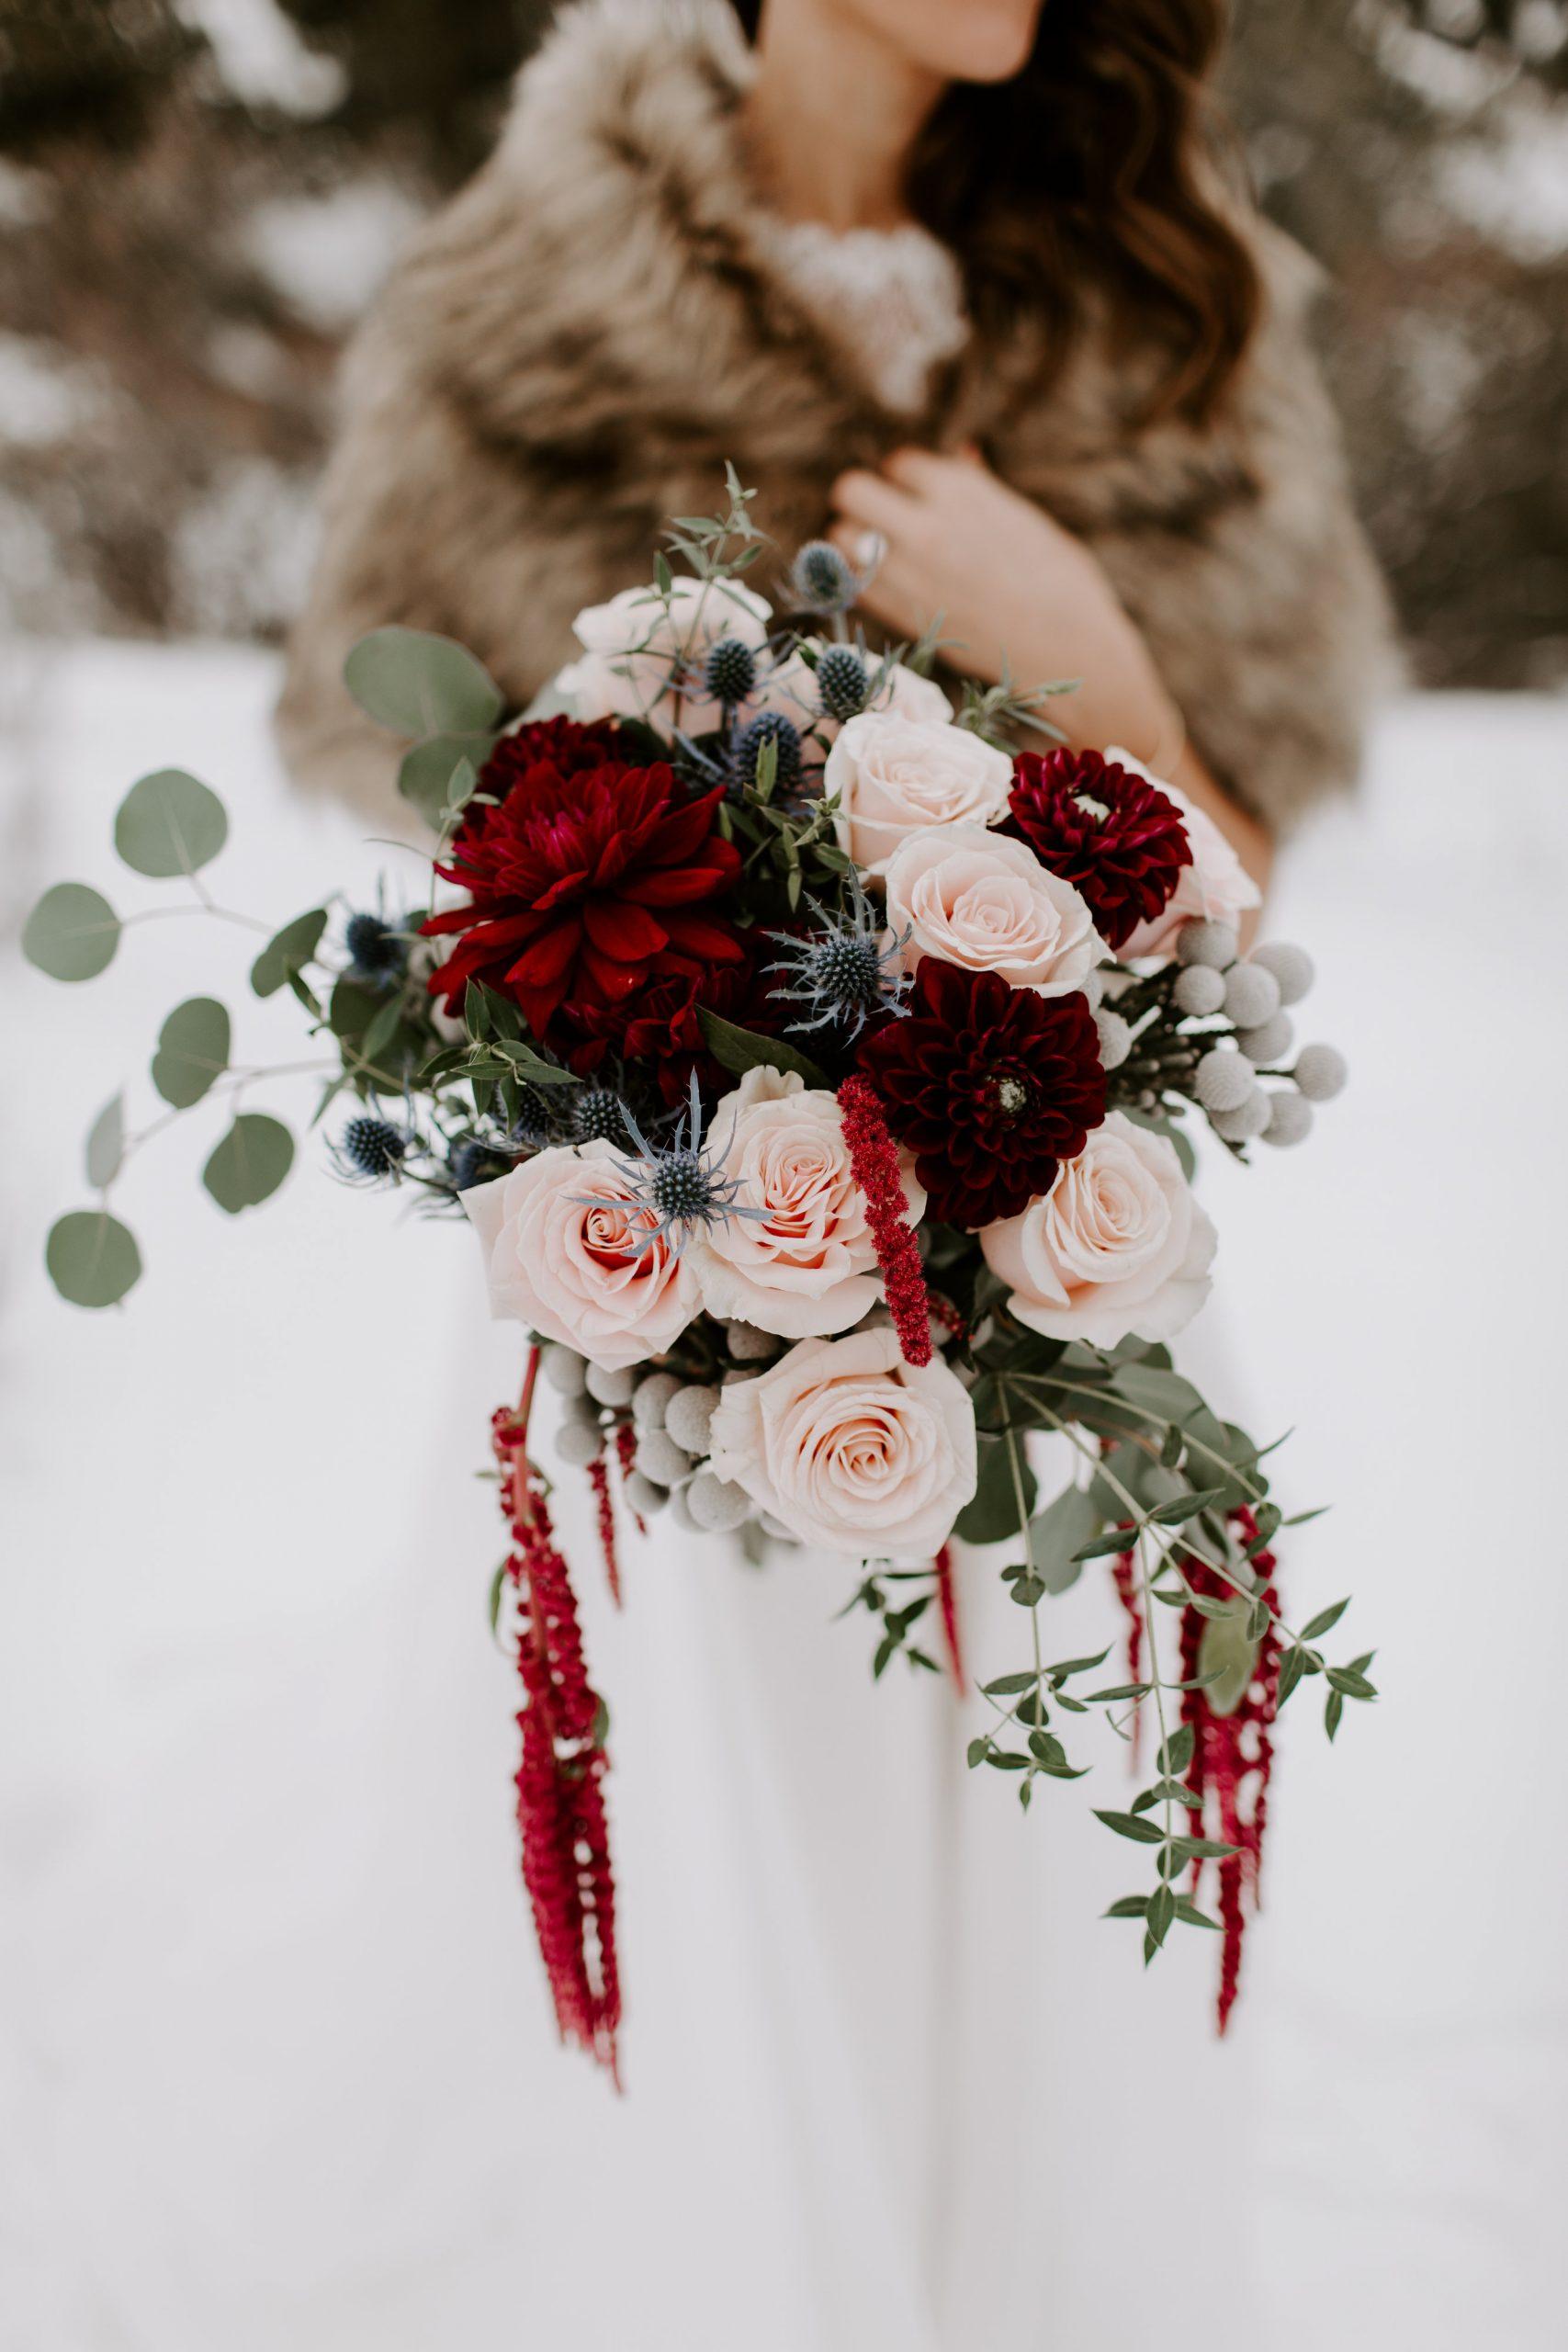 Botanicals Floral Art | Wedding Florist in Glenwood Springs, Colorado featured on WED West Slope - a directory for wedding vendors.